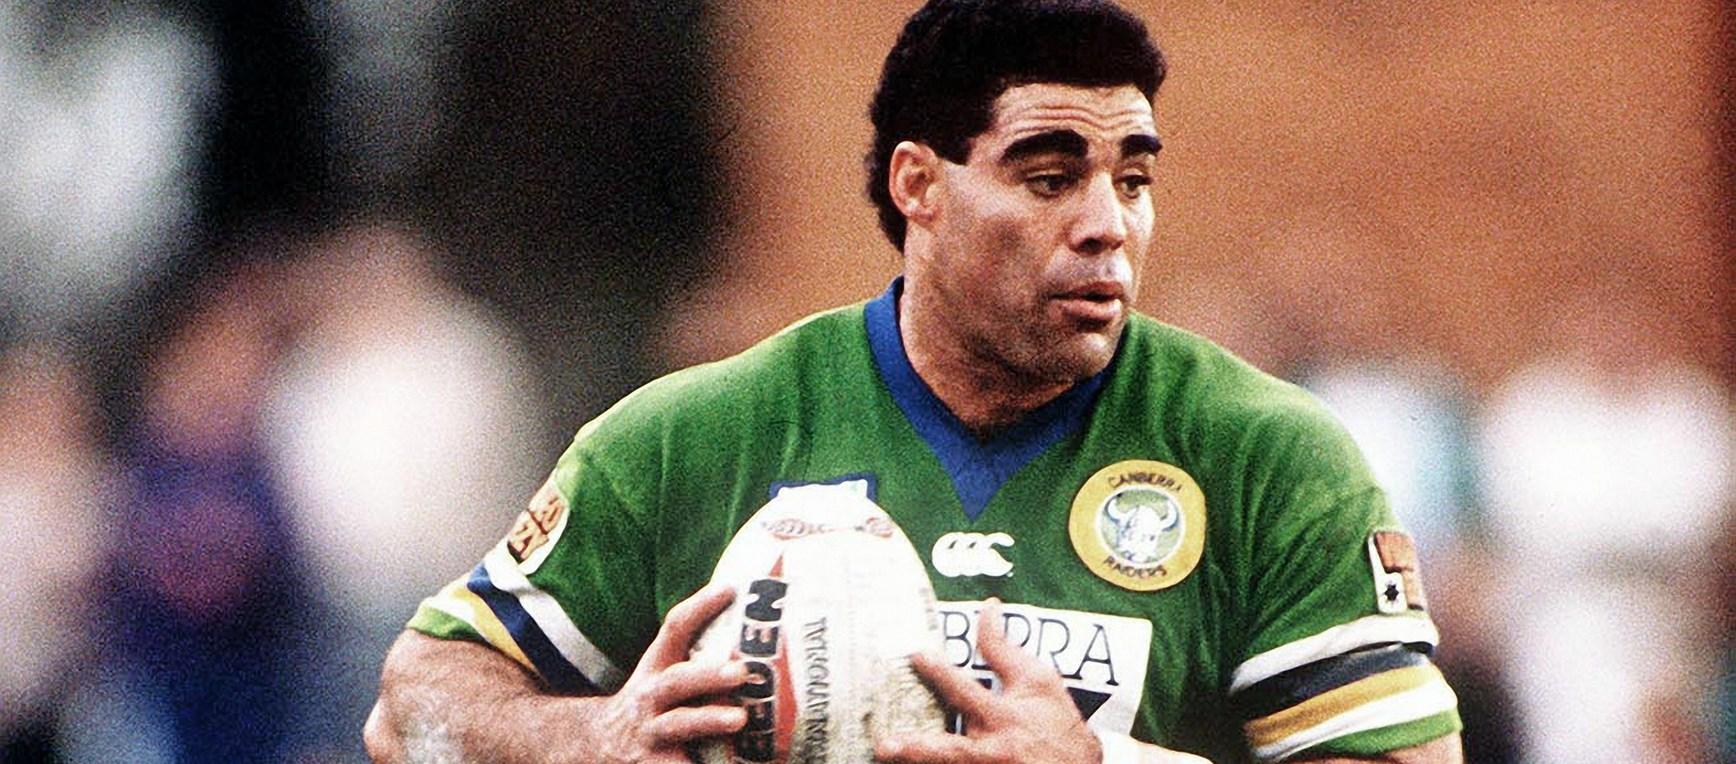 Rugby league icons: Mal Meninga